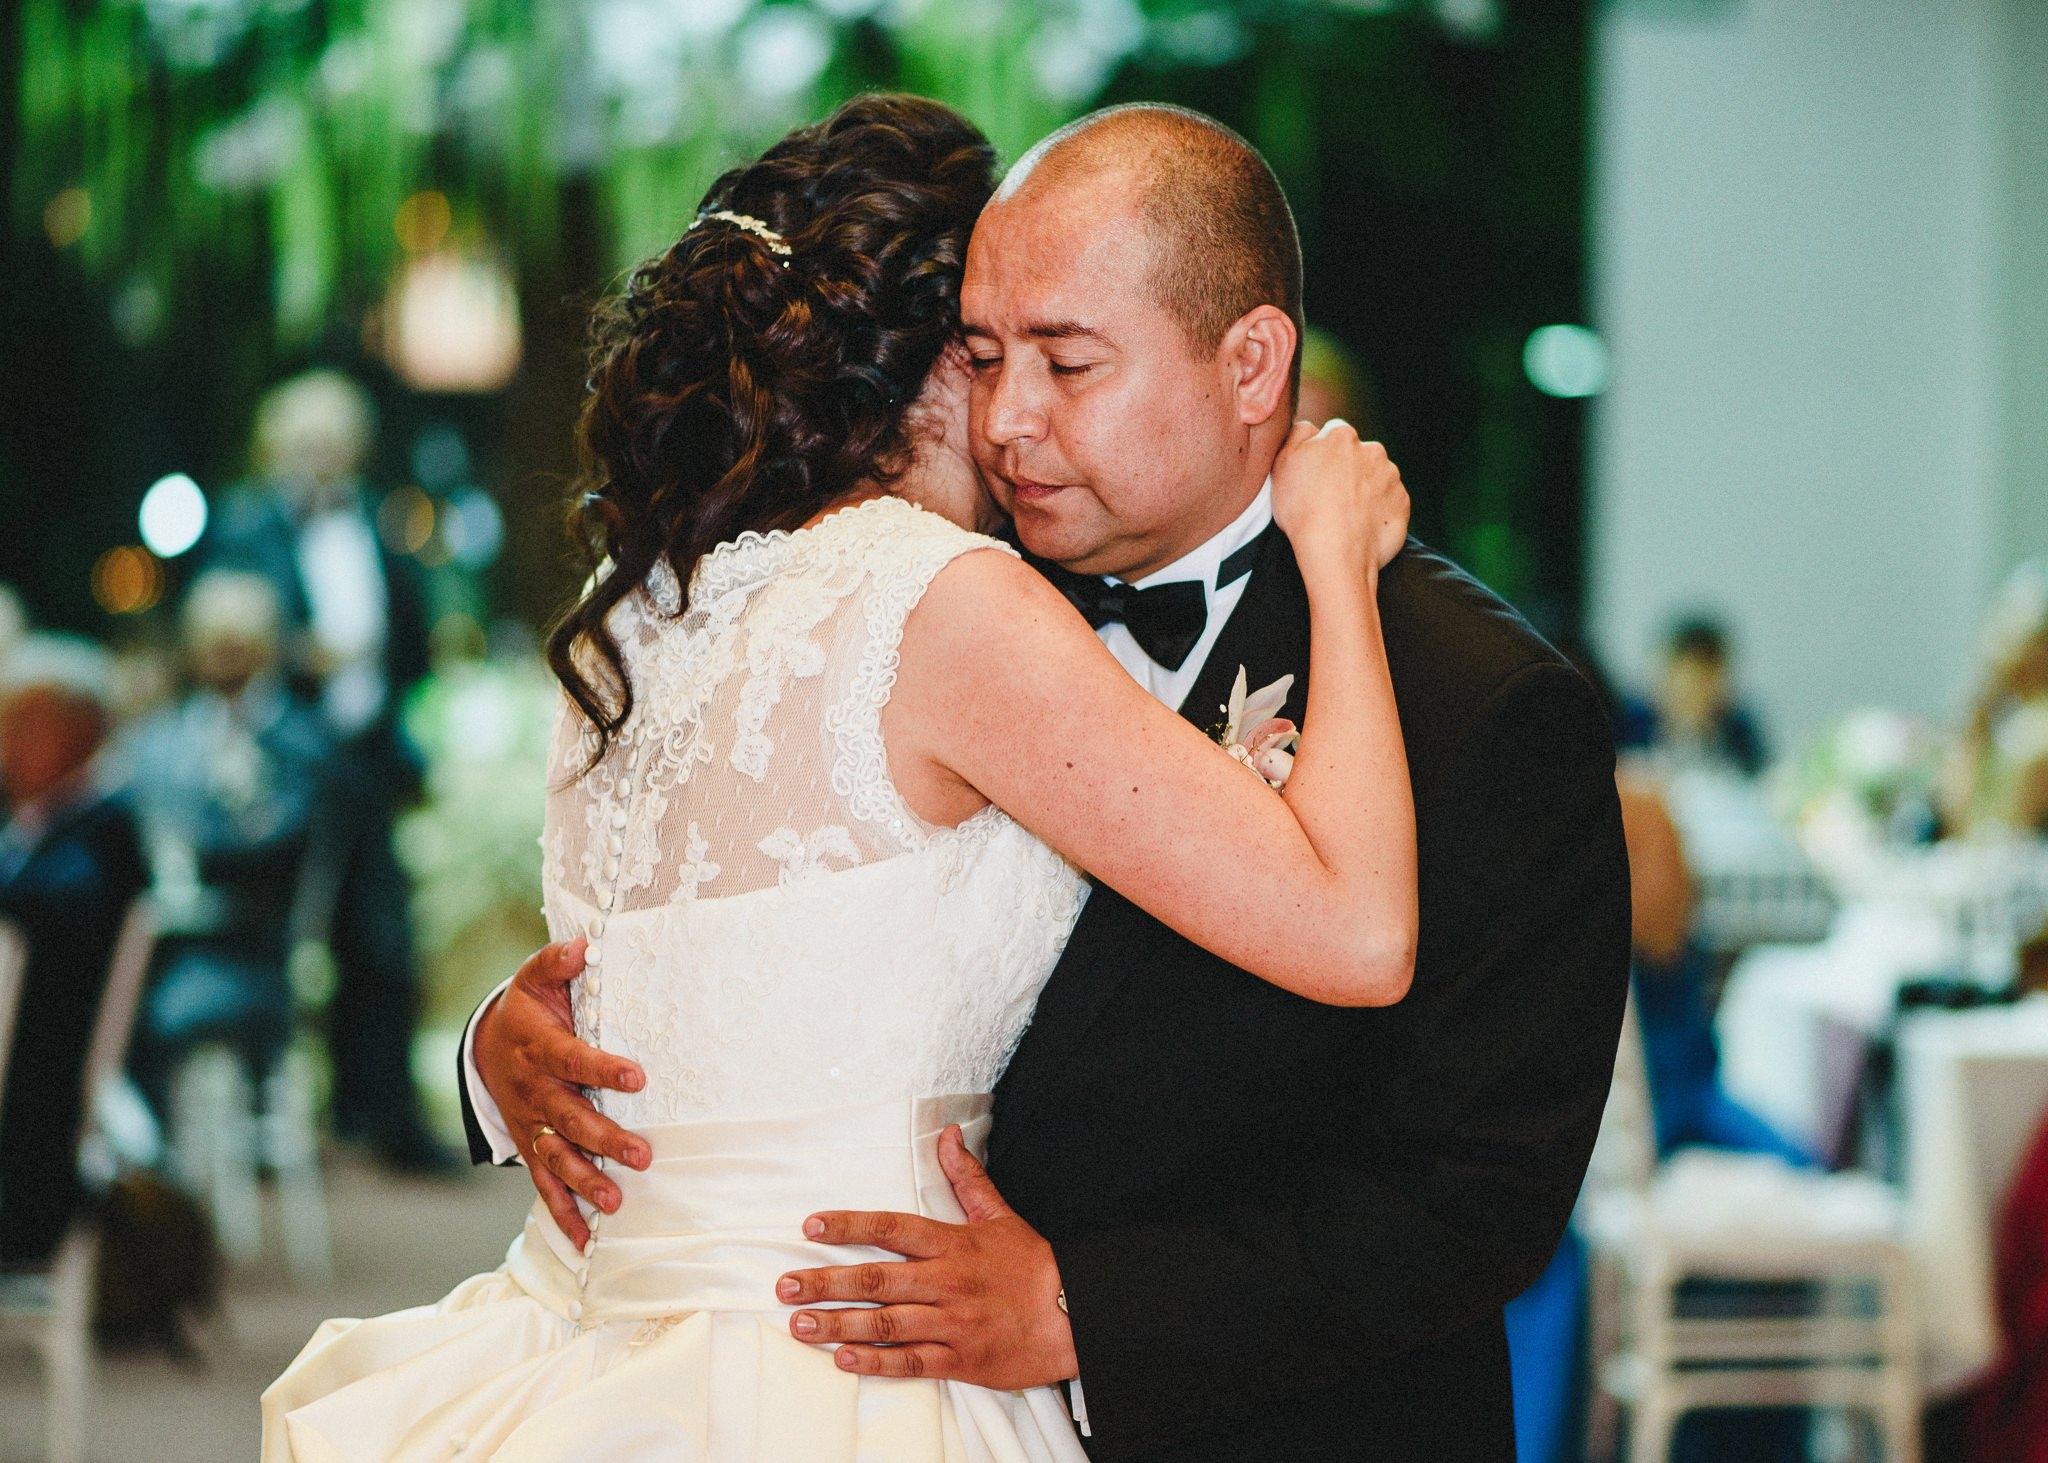 Wedding-Boda-Tulancingo-Hidalgo-Salon-Essenzia-Luis-Houdin-49-film